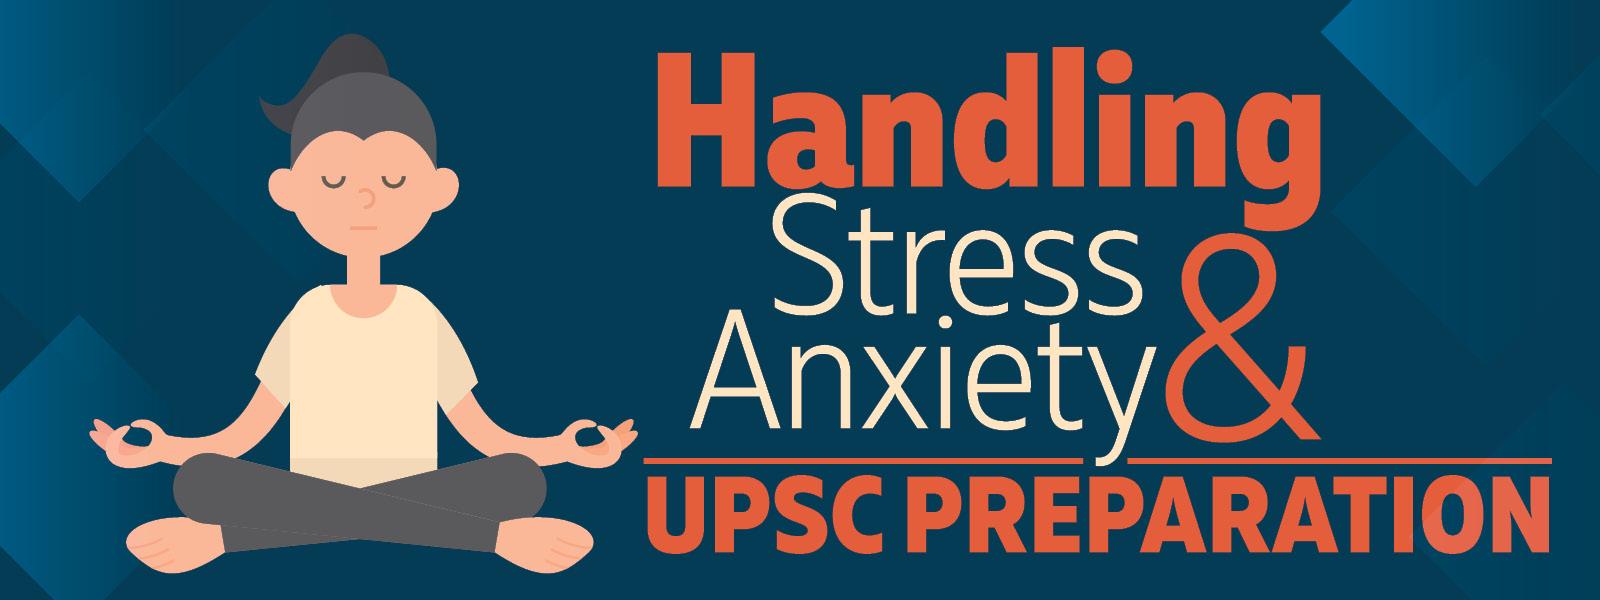 Handling stress & anxiety